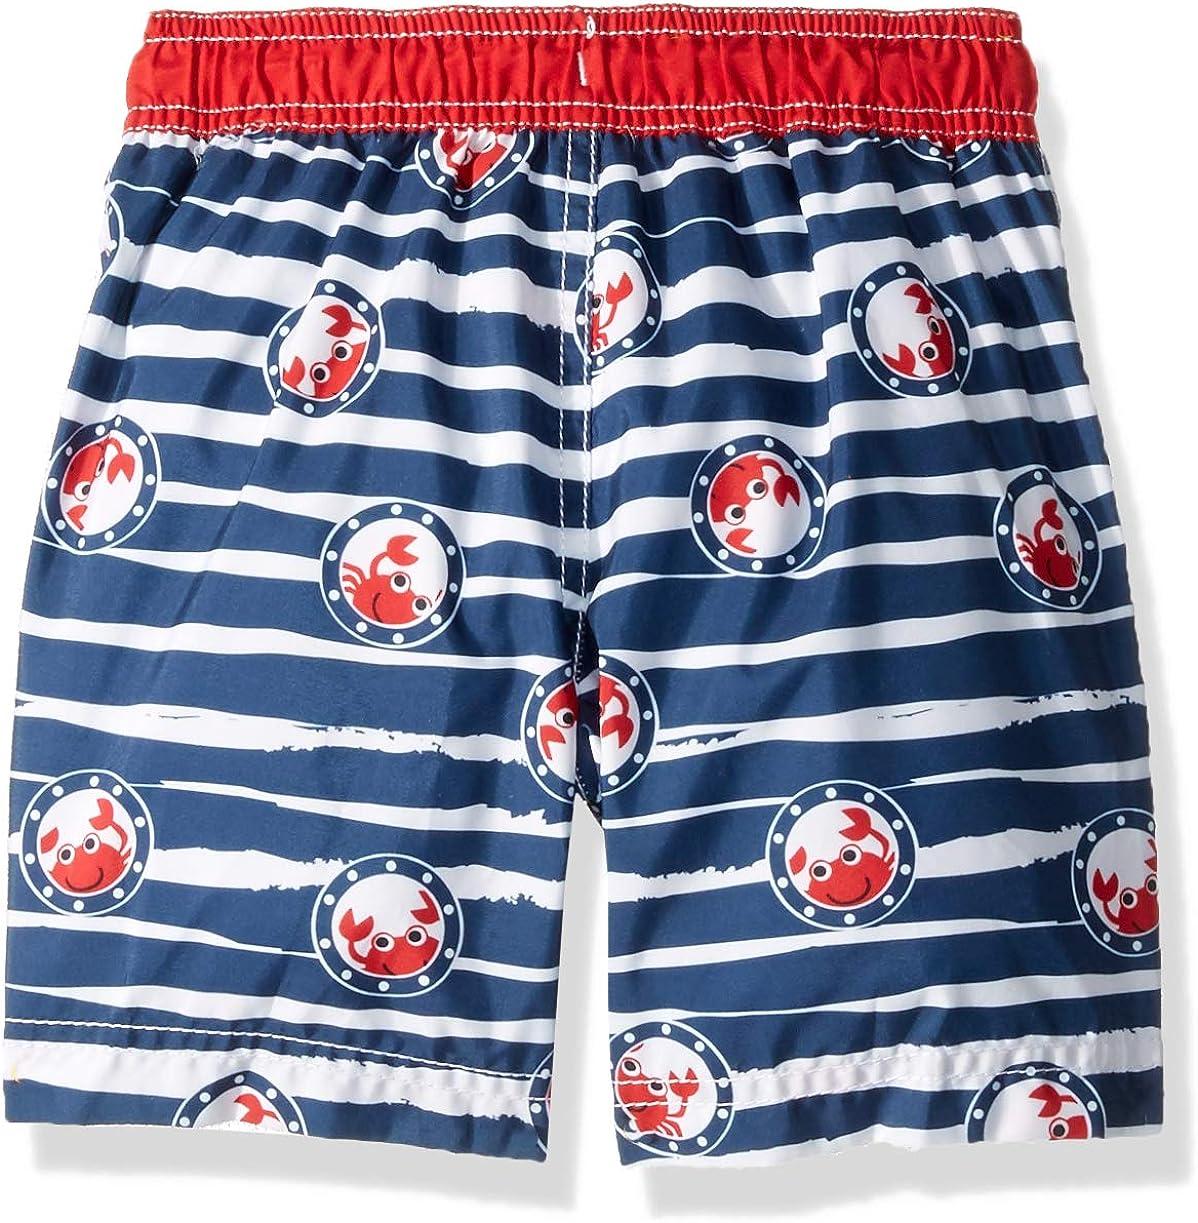 Wippette Boys Quick Dry Swim Trunk